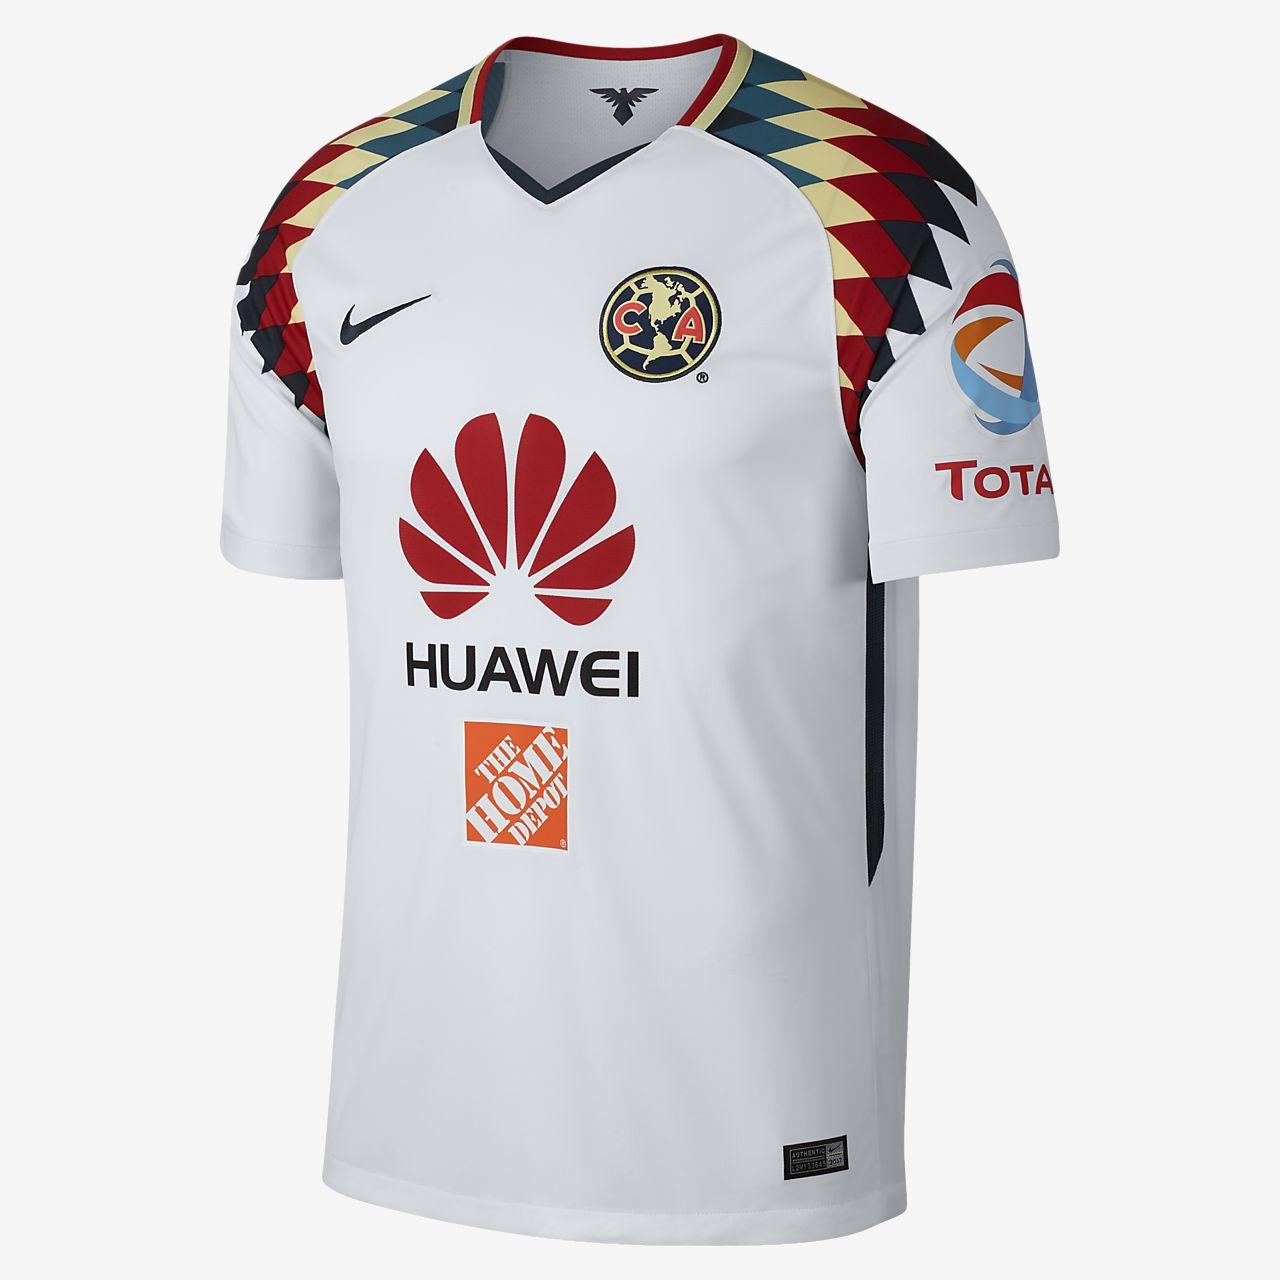 ... 2017/18 Club America Stadium Away Men's Football Shirt